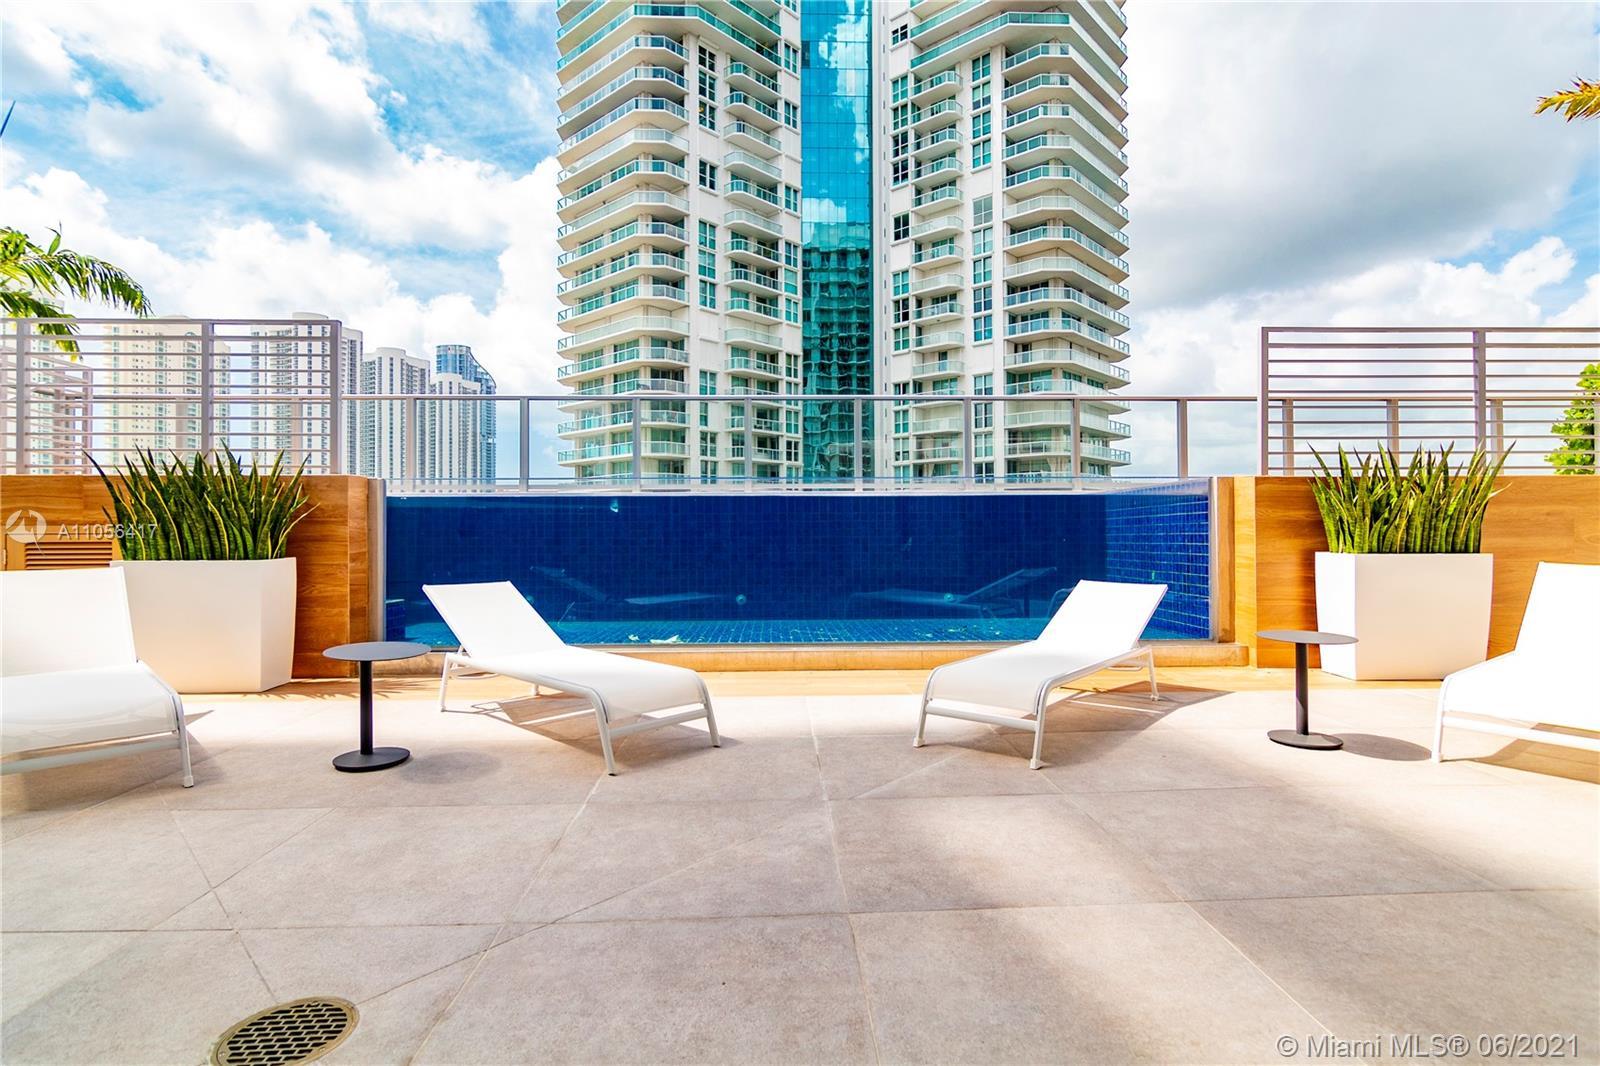 Parque Tower 1 #4-502 - 300 Sunny Isles Blvd #4-502, Sunny Isles Beach, FL 33160